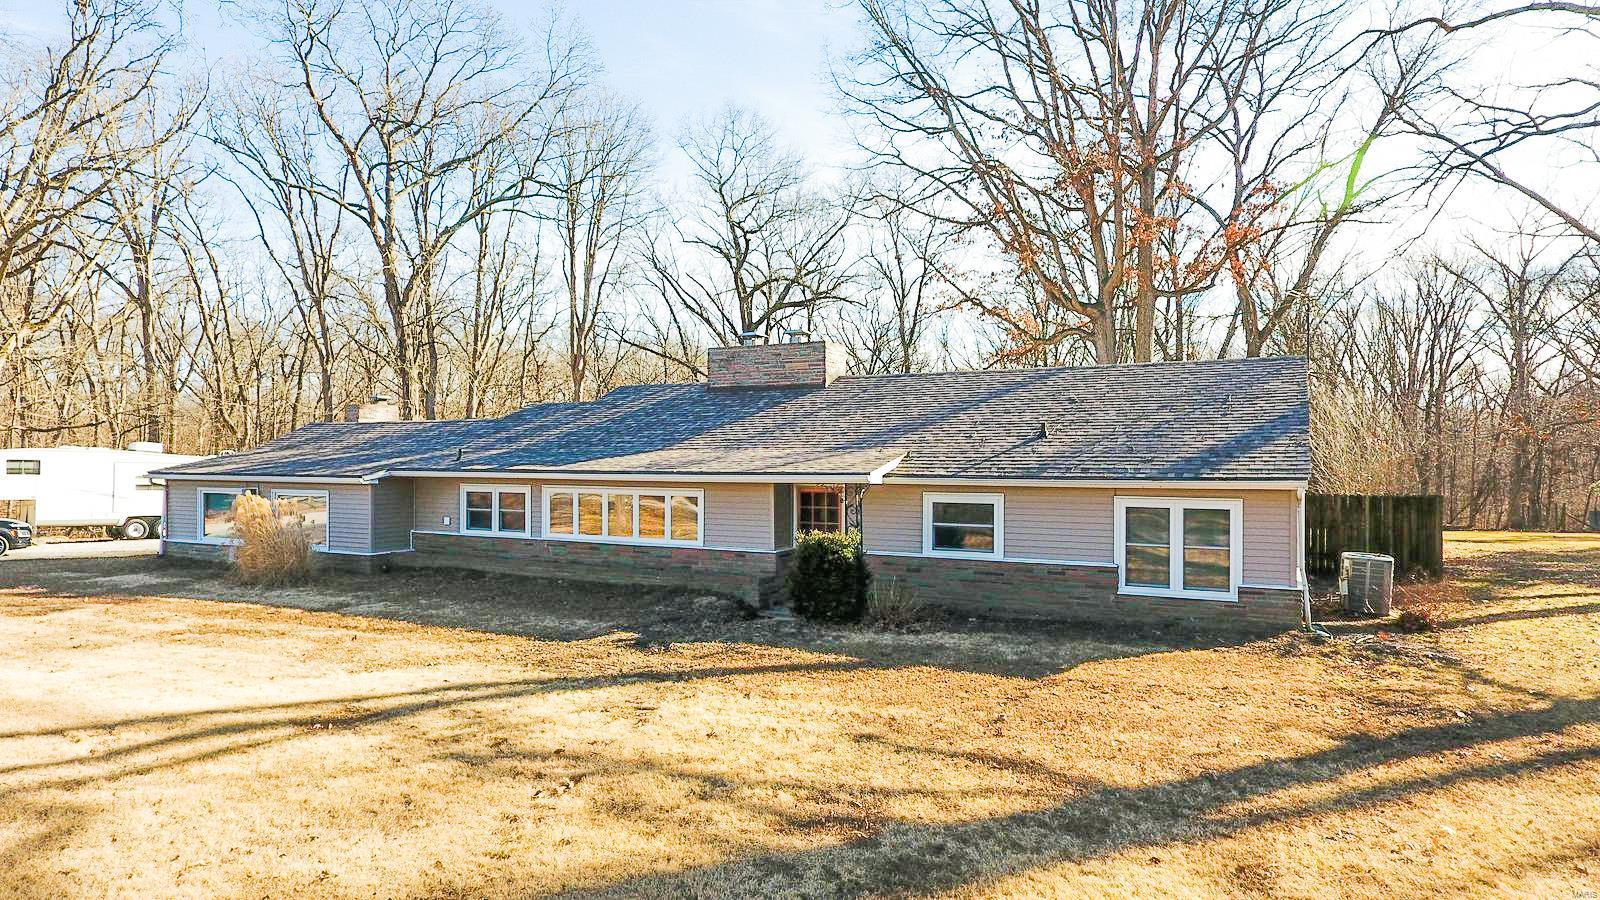 3204 S Country Club Lane Property Photo - Staunton, IL real estate listing